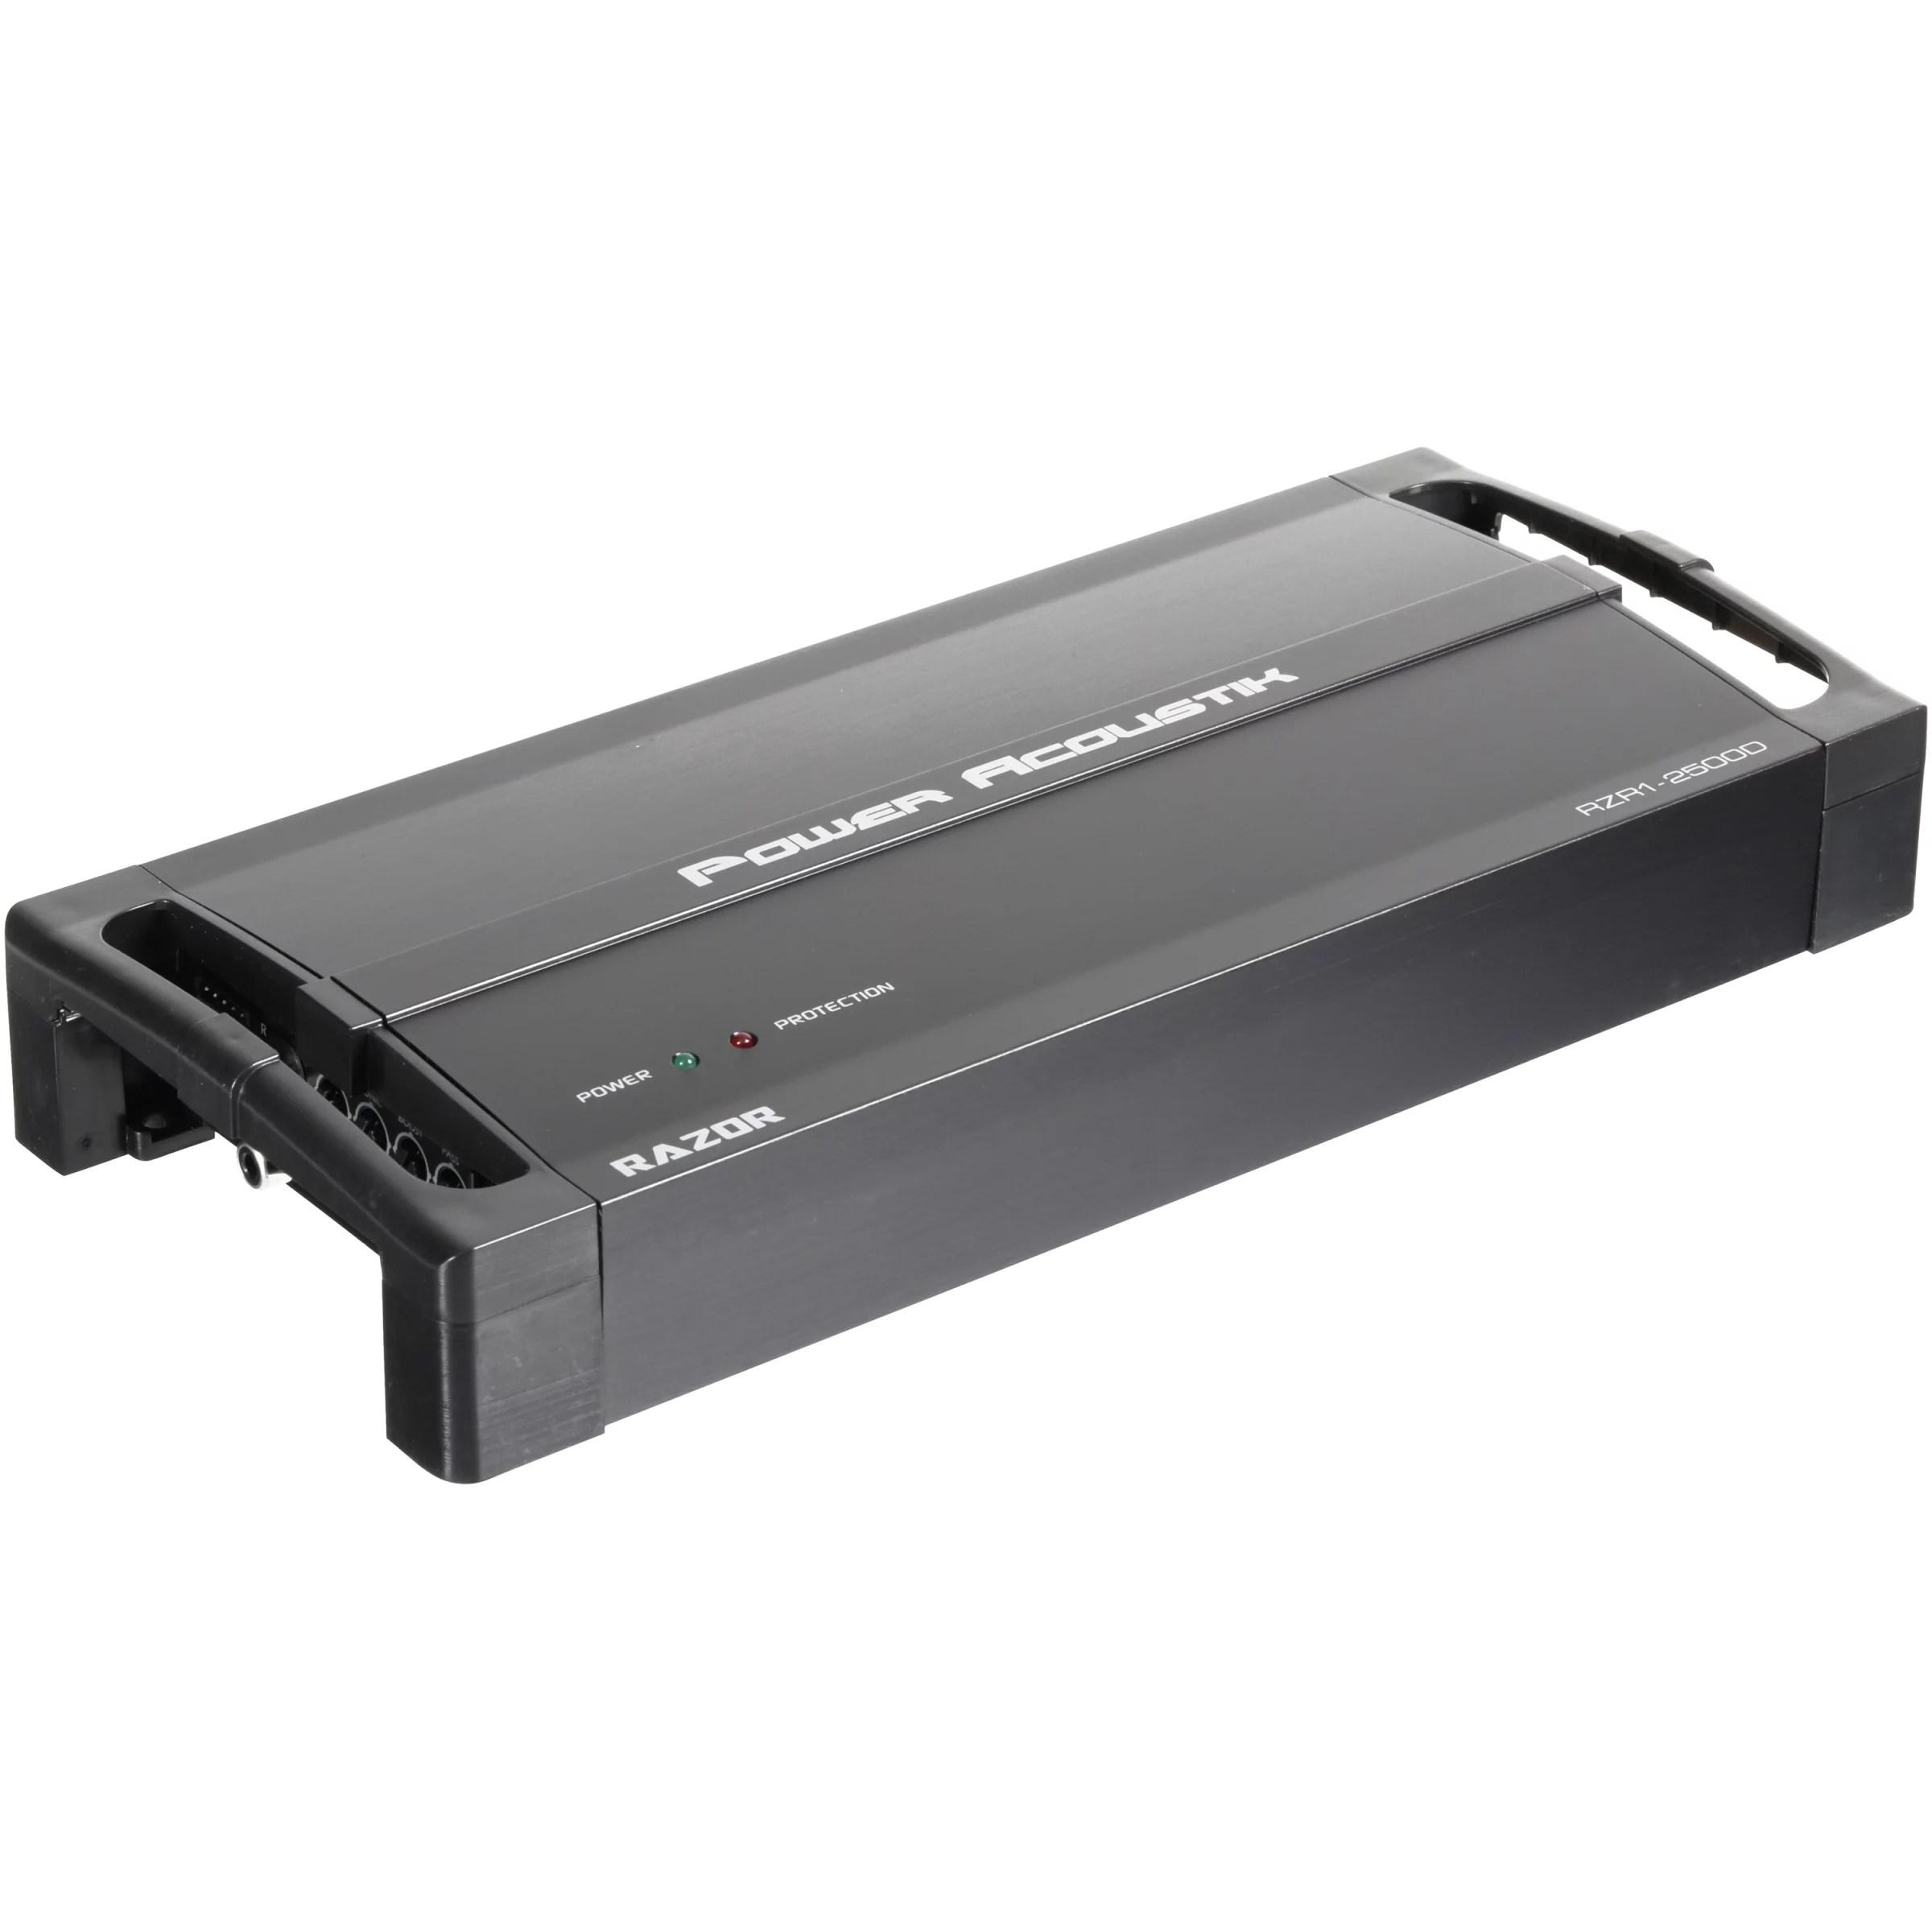 power acoustik 2 ohm 2 500 watt max subwoofer amplifier 5 pc box power acoustik akit8 amplifier wiring kit 8gauge walmartcom [ 2400 x 2400 Pixel ]